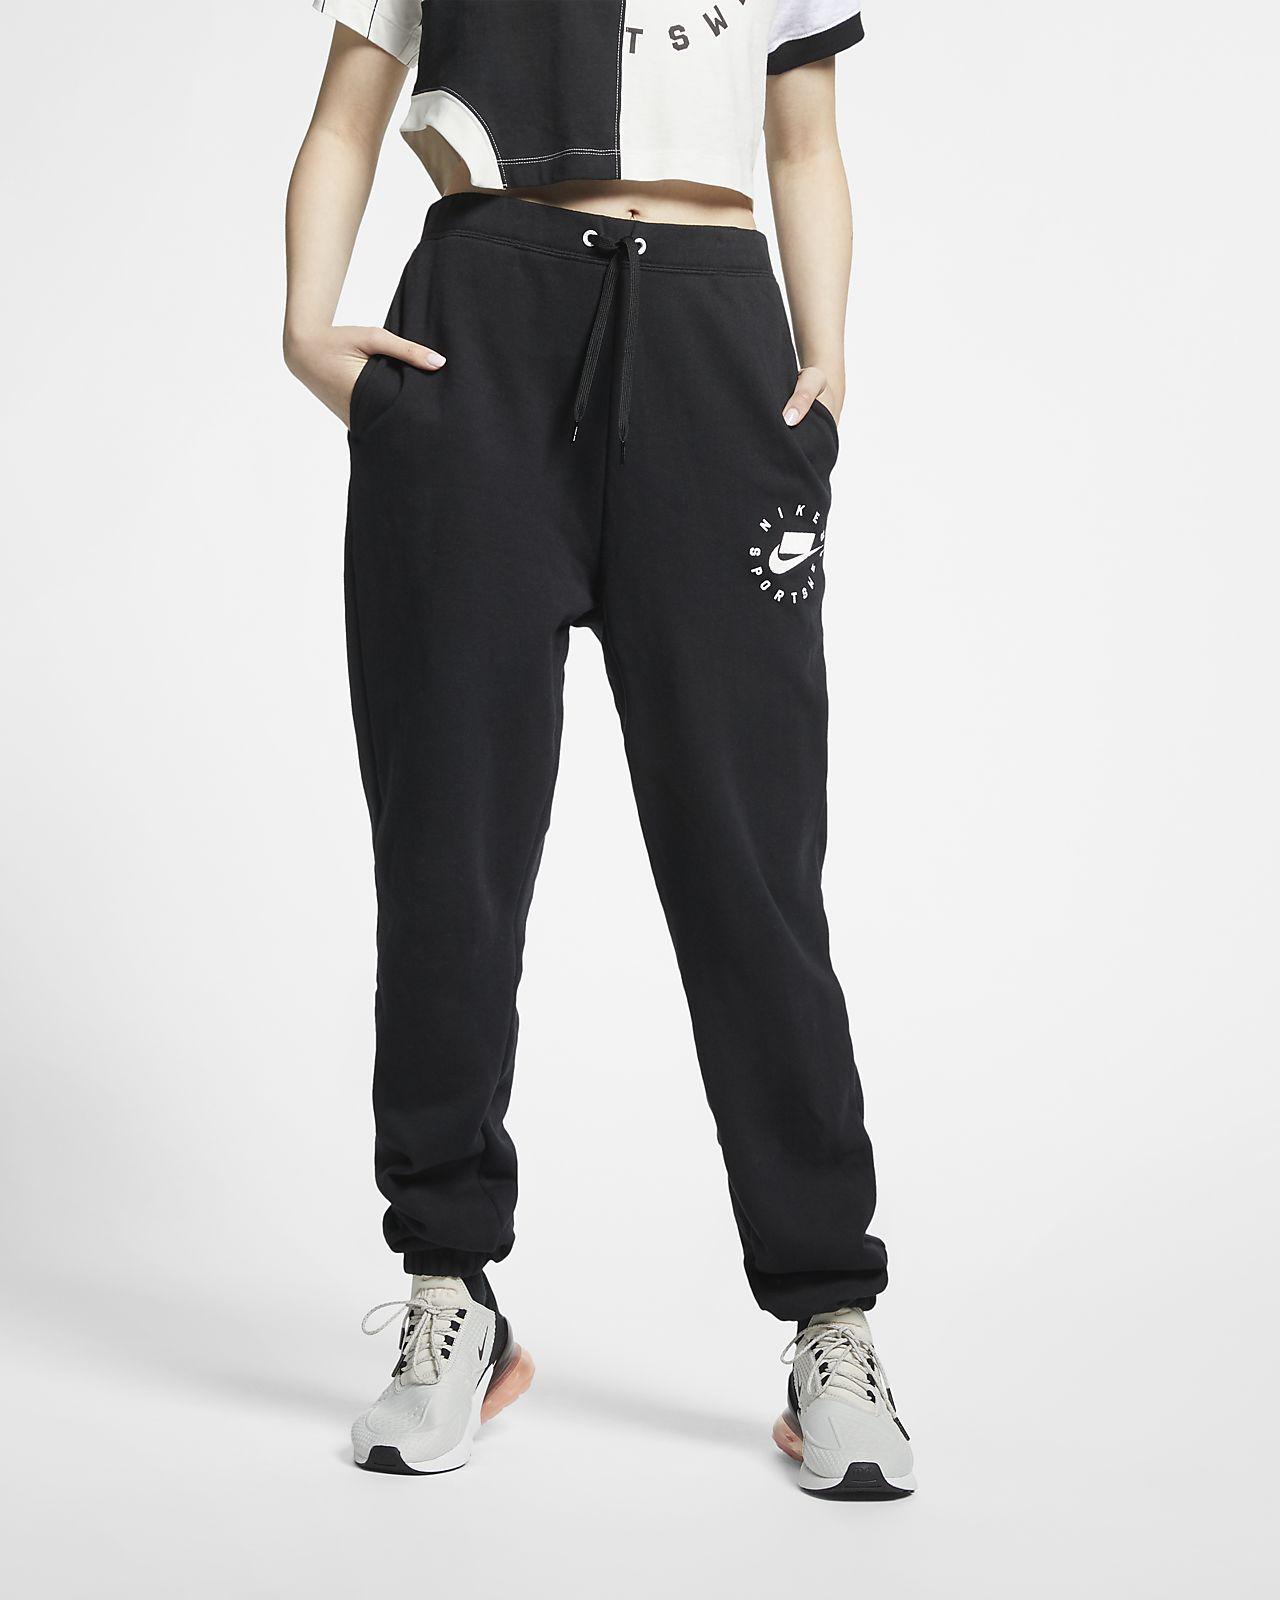 Nike Sportswear NSW Women's French Terry Pants